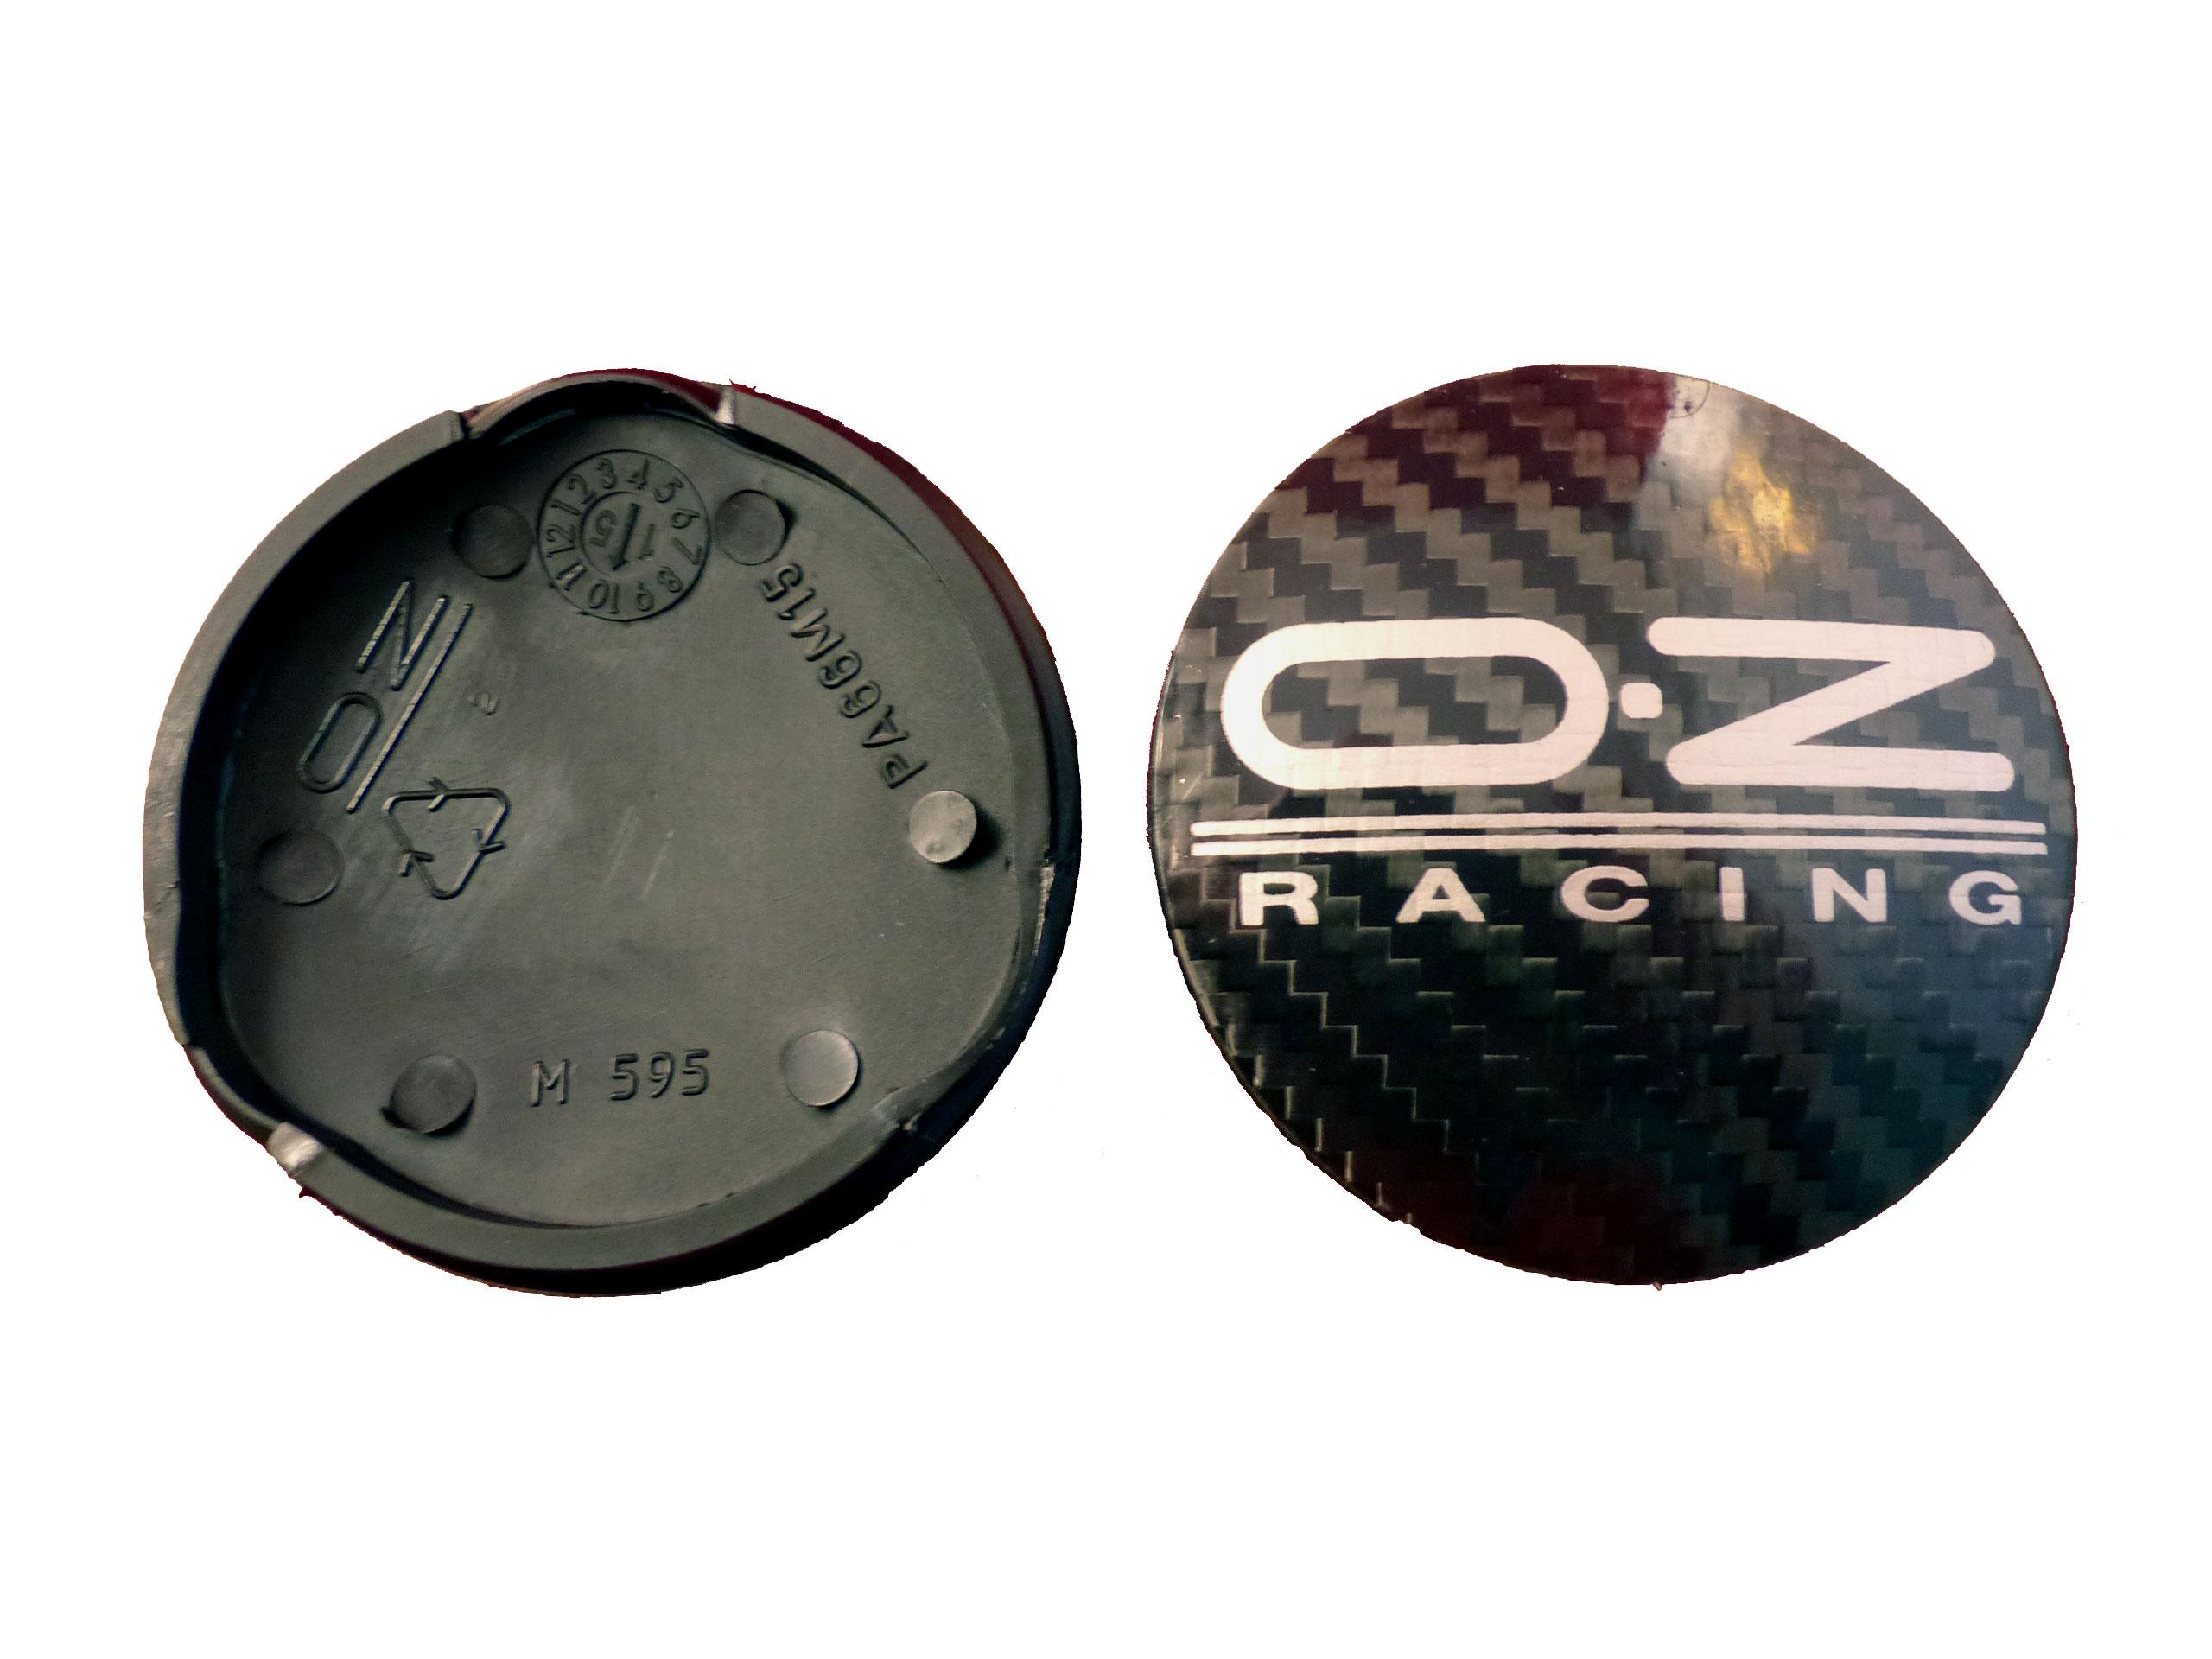 OZ Nabendeckel Nabenkappen Felgendeckel Carbon schwarz 62mm M595 Alufelgen